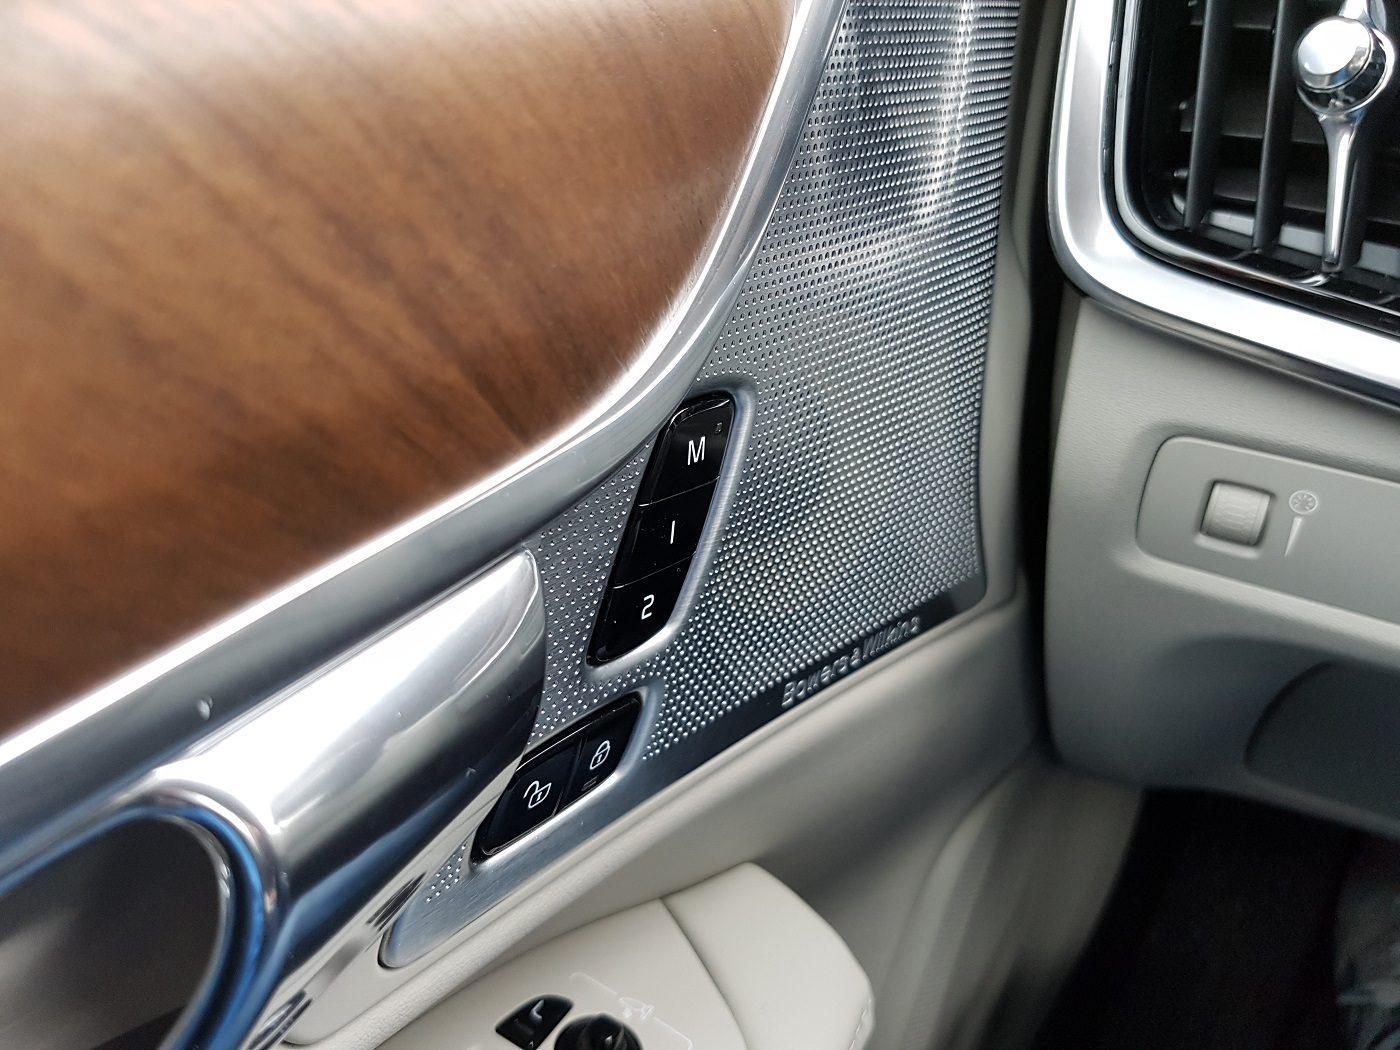 Volvo V90 Details